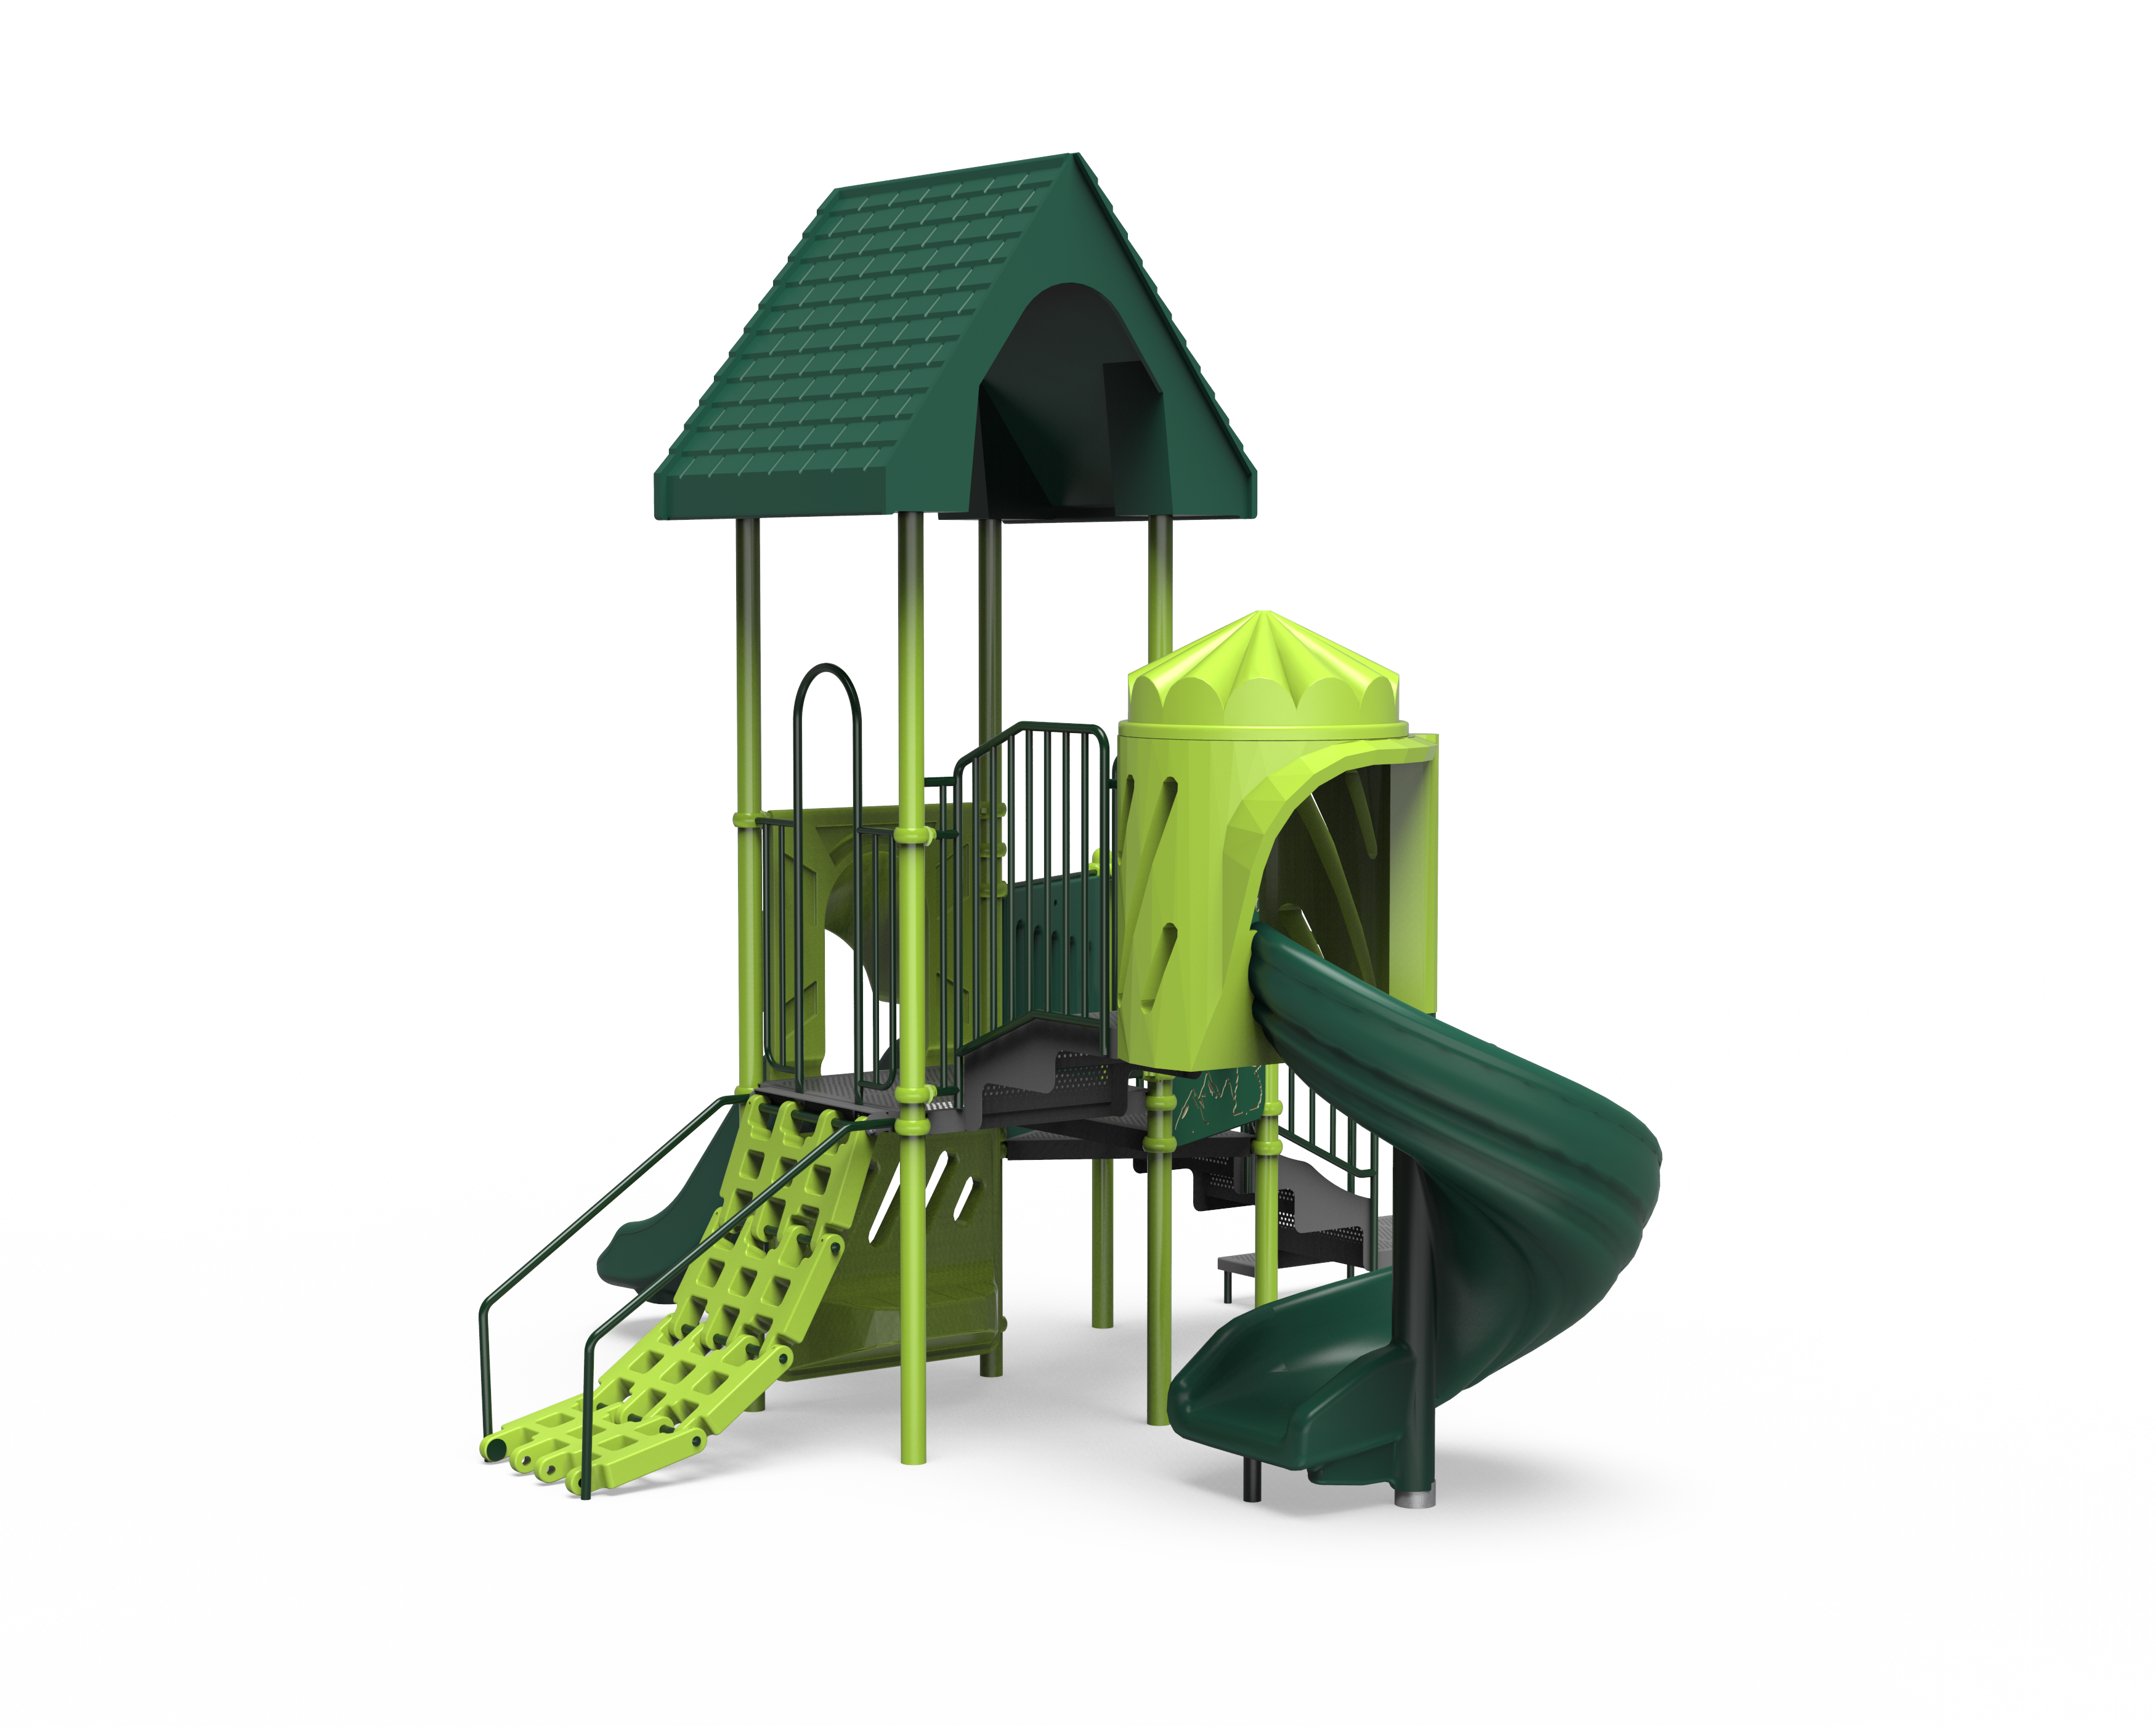 Tots Choice Structure (718S197J)